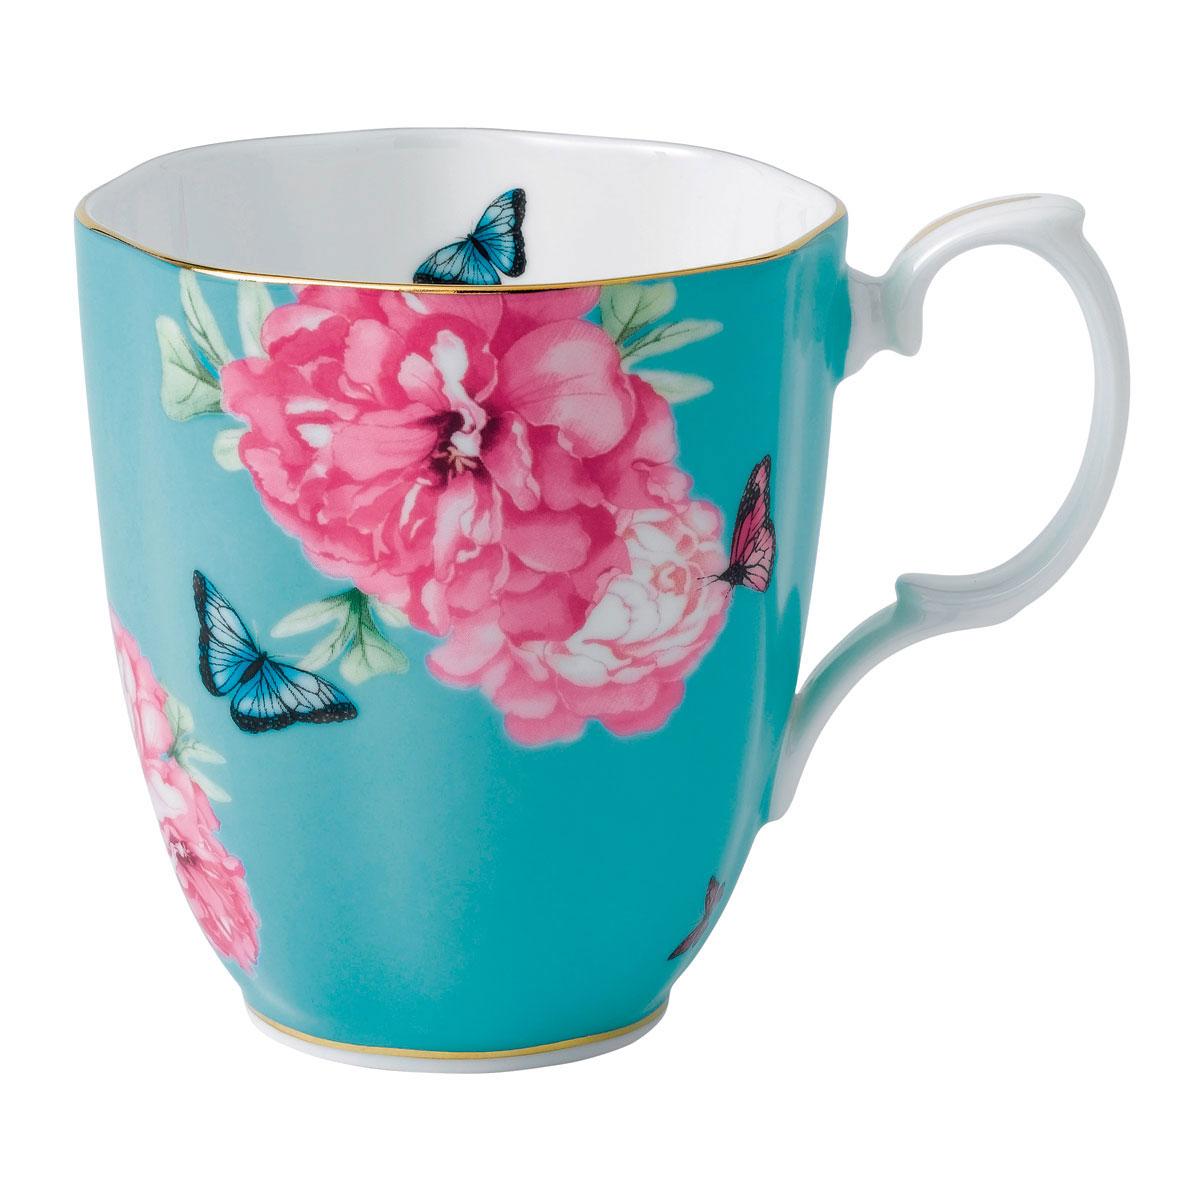 Royal Albert Friendship Vintage Mug 13.5 Oz Turquoise